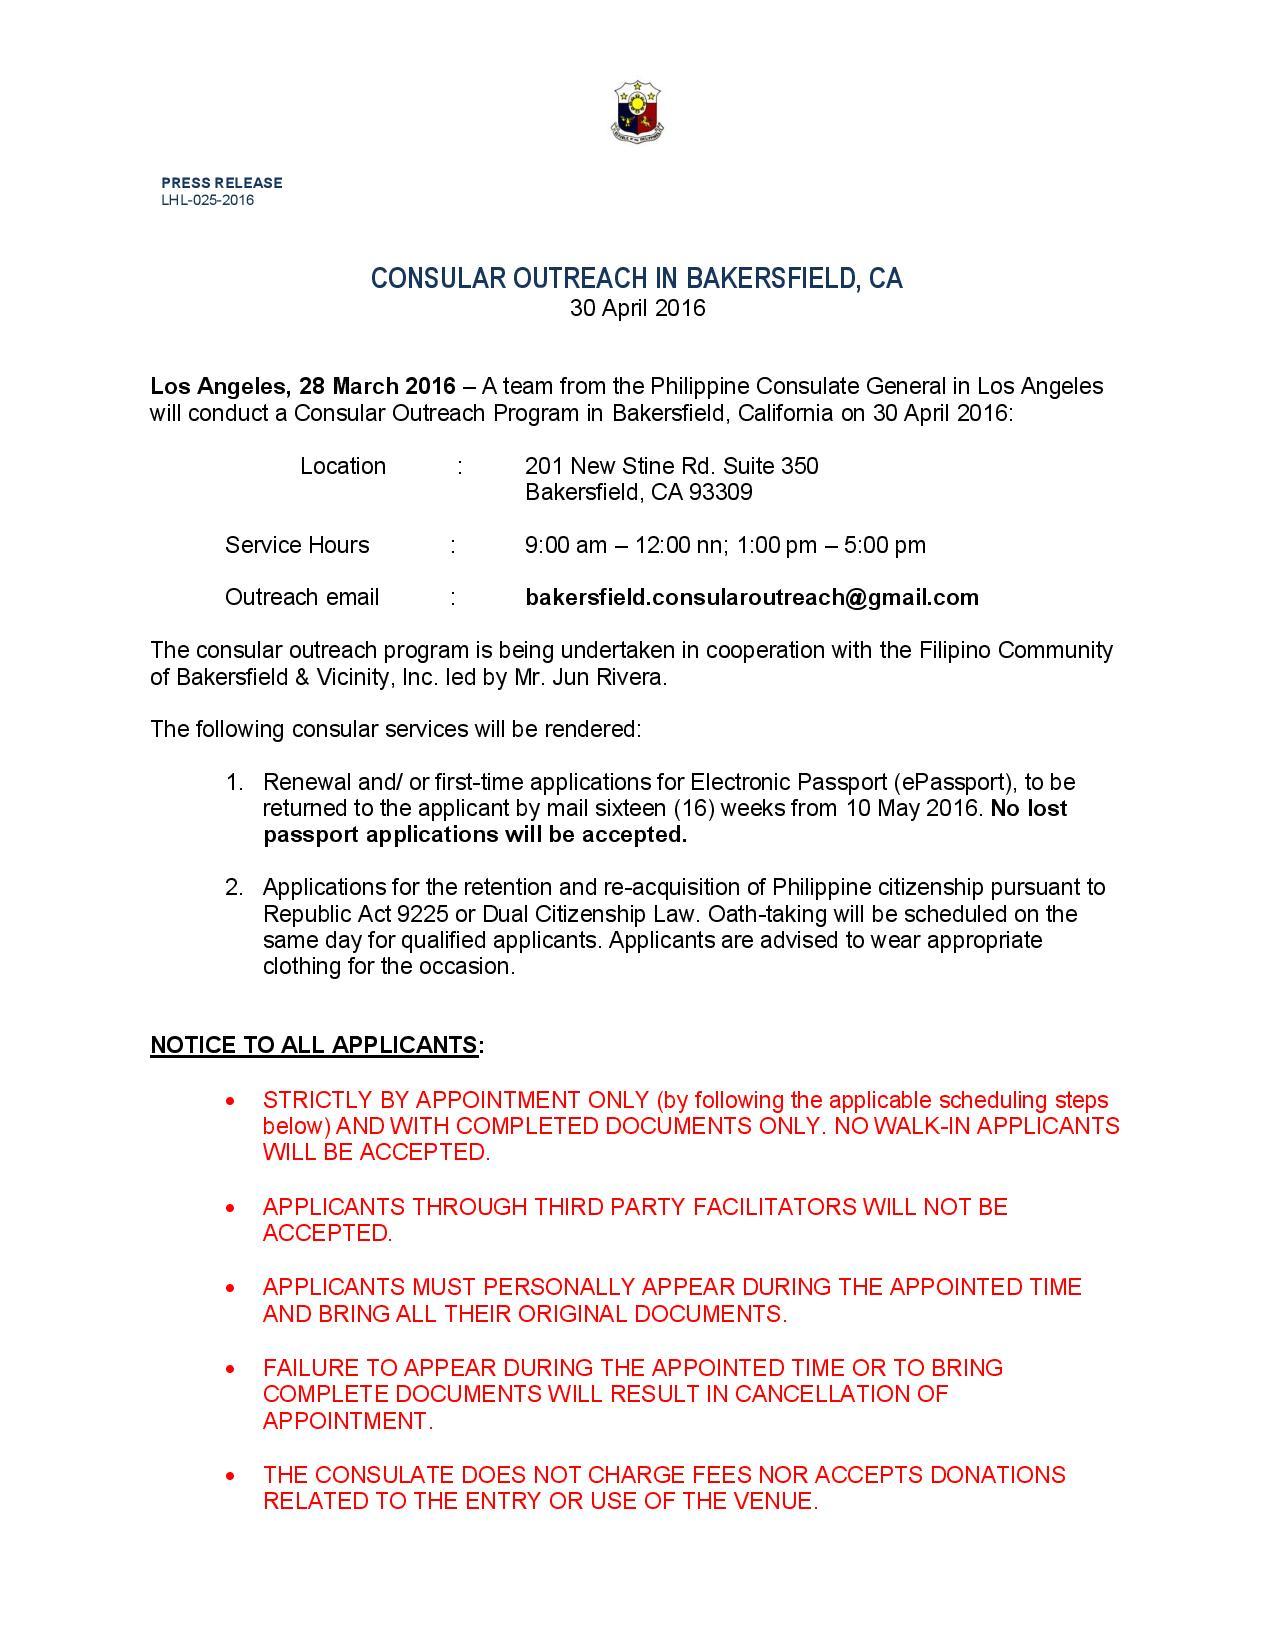 Consular Outreach in Bakersfield, CA – Philippine Consulate